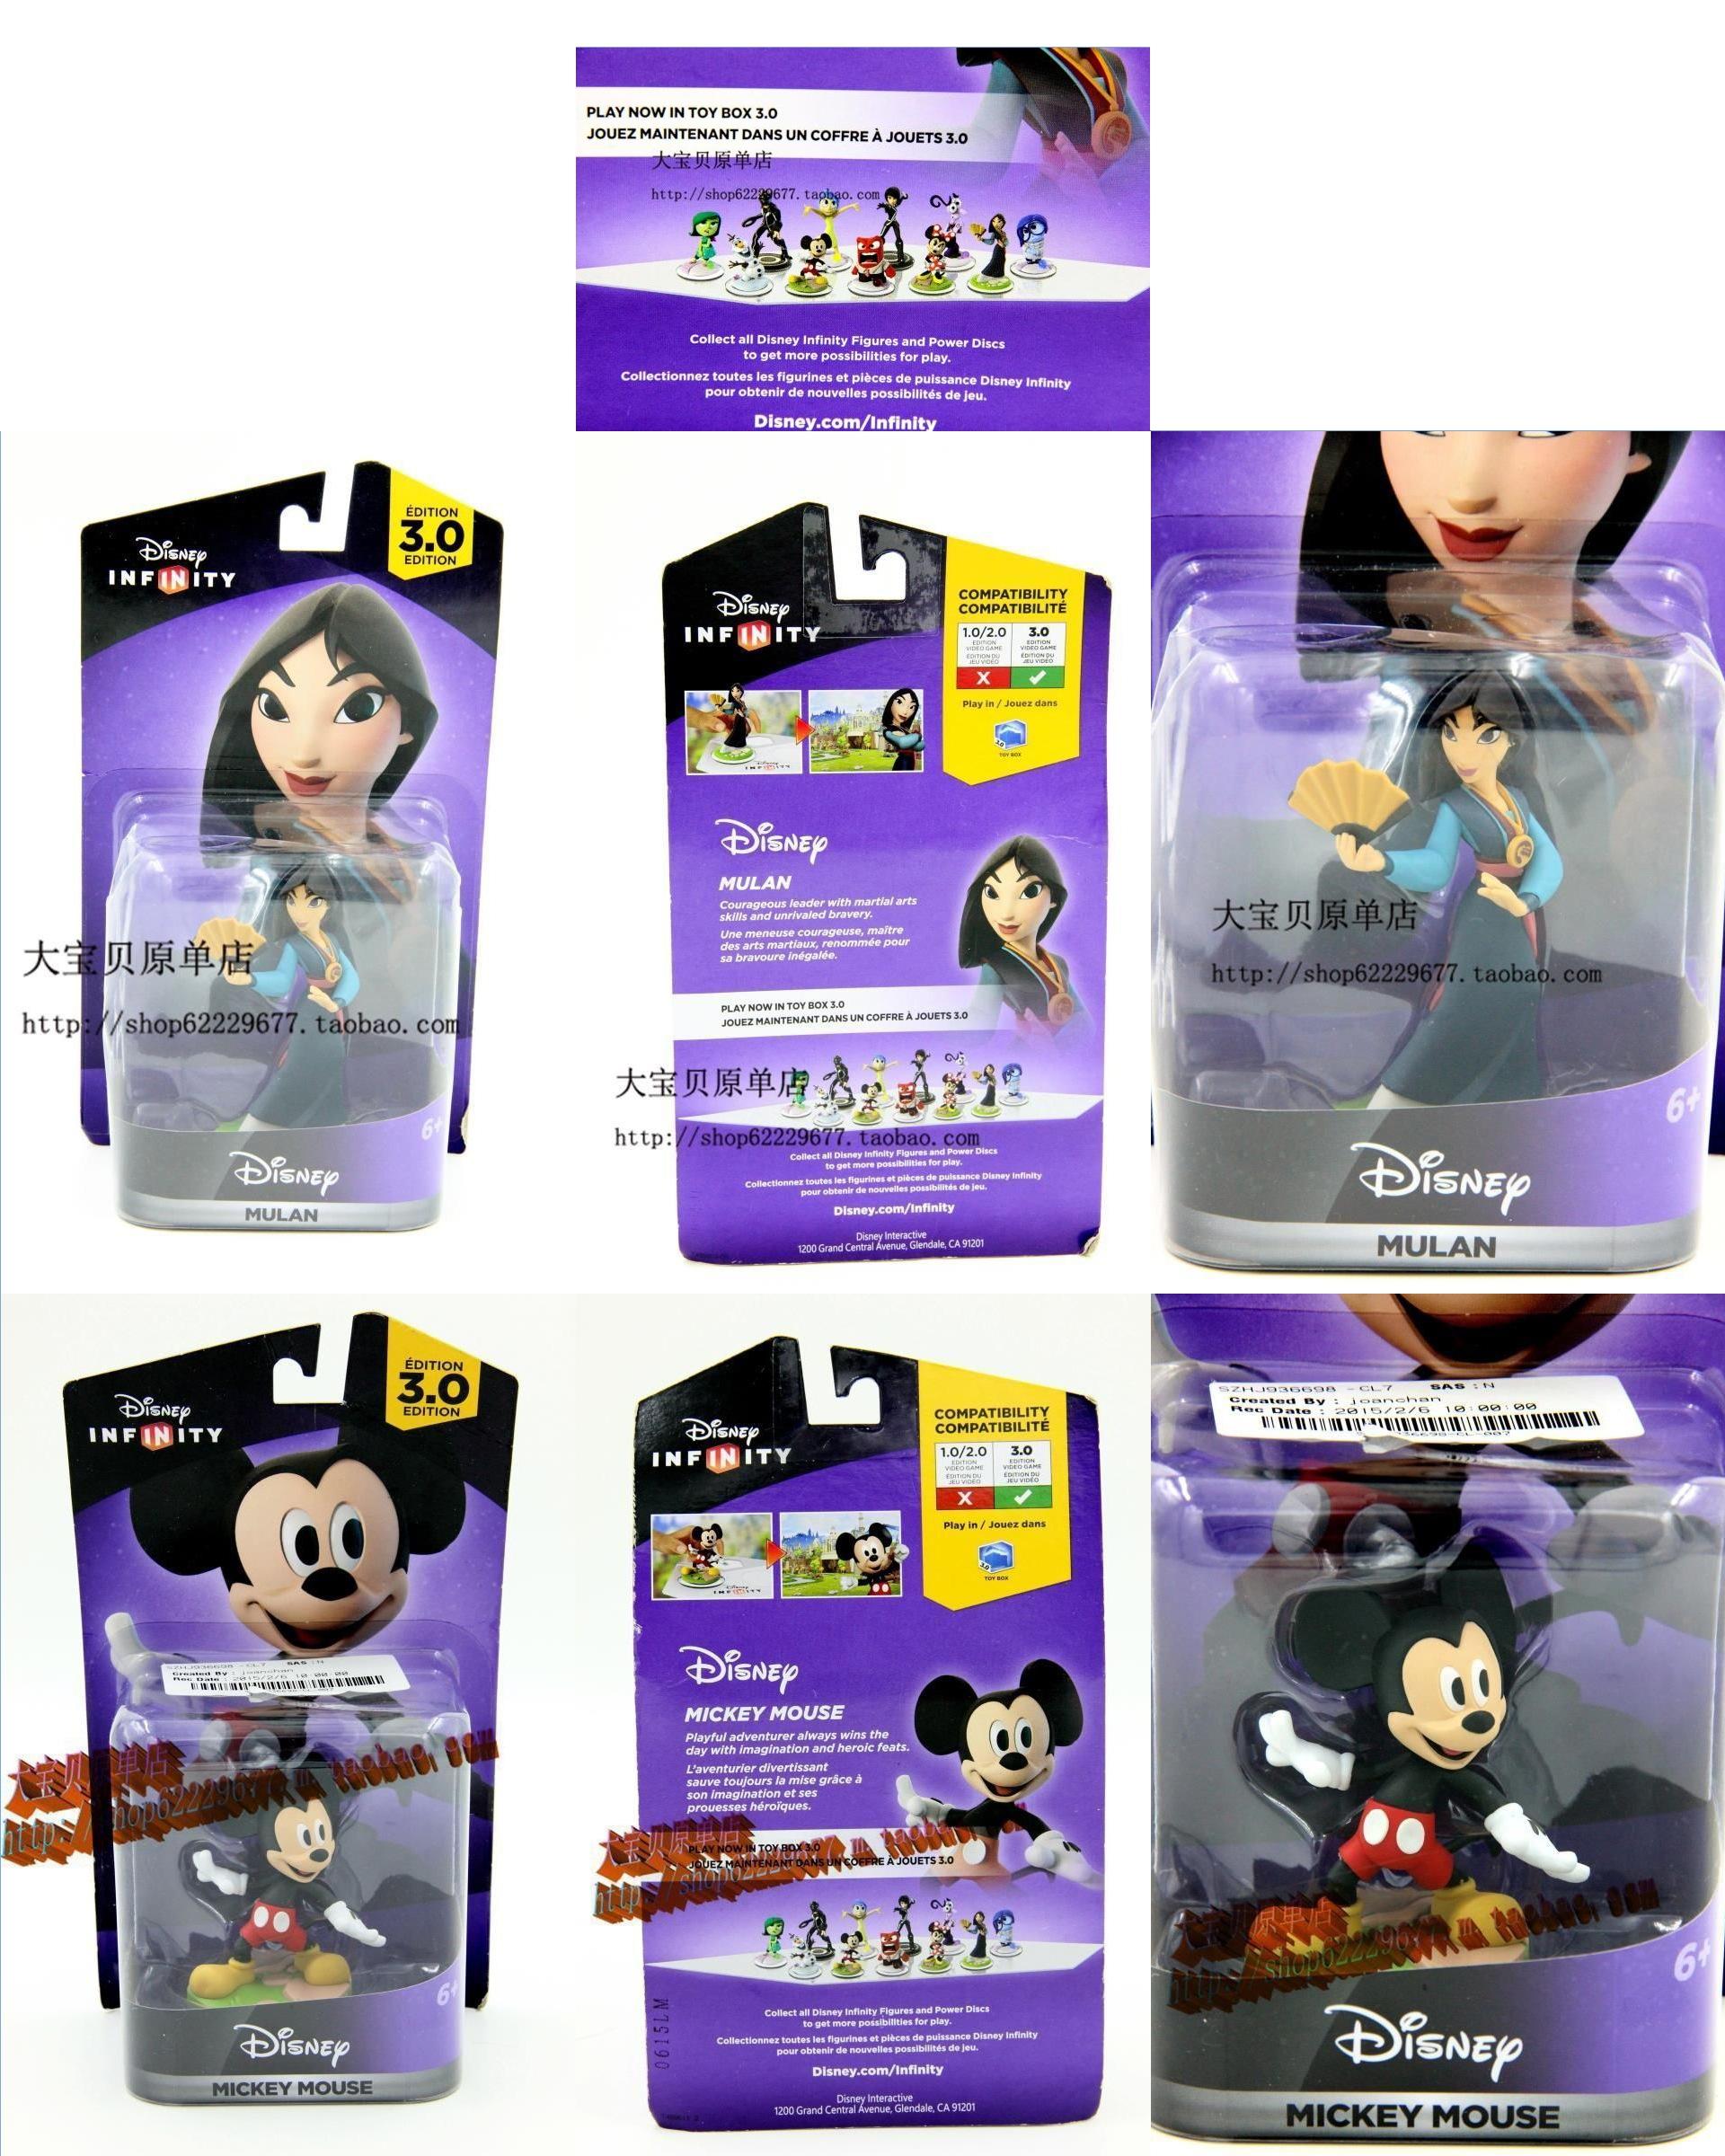 Disney Infinity 3 0 Figures Leak Include Mulan Olaf And